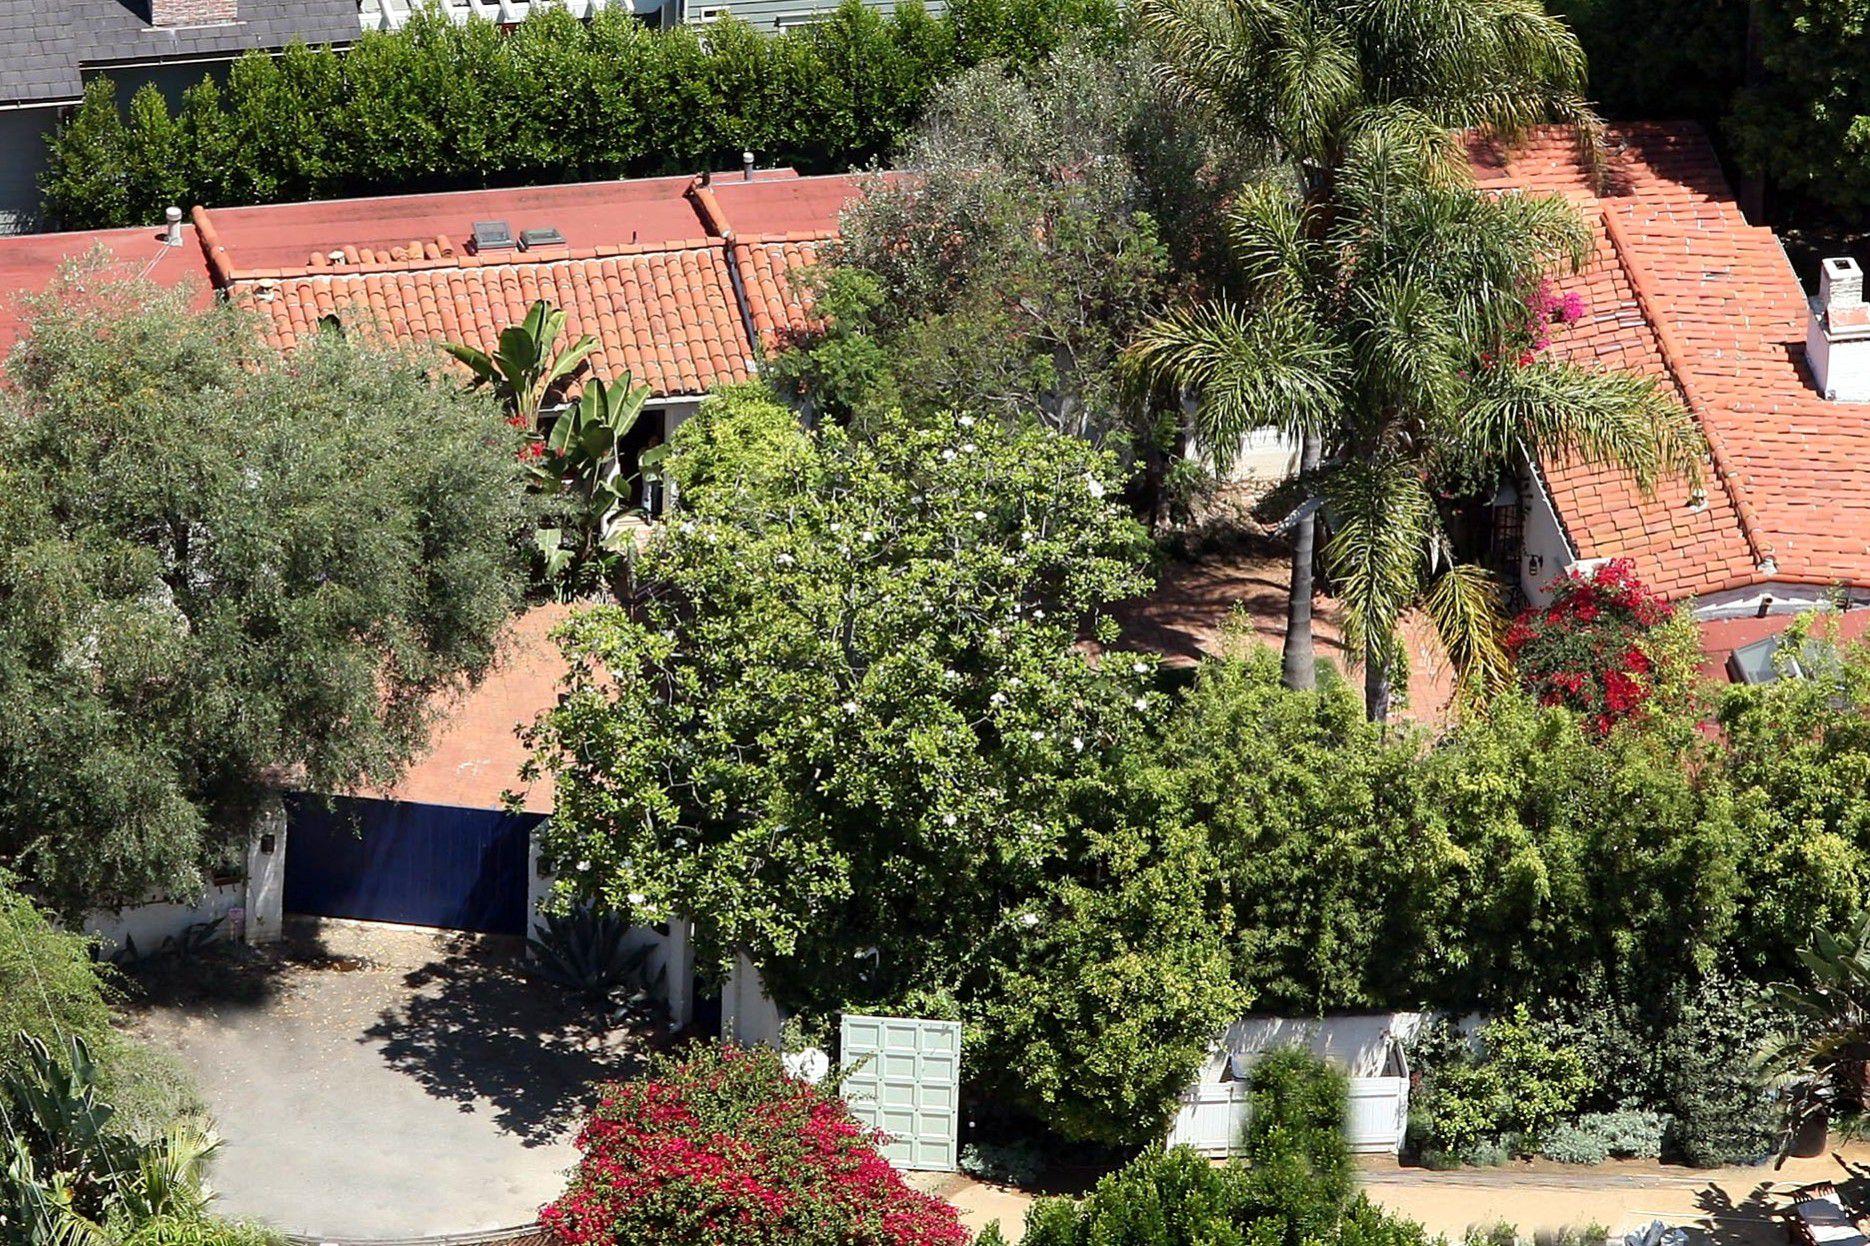 Aerial view of Marilyn Monroe's house